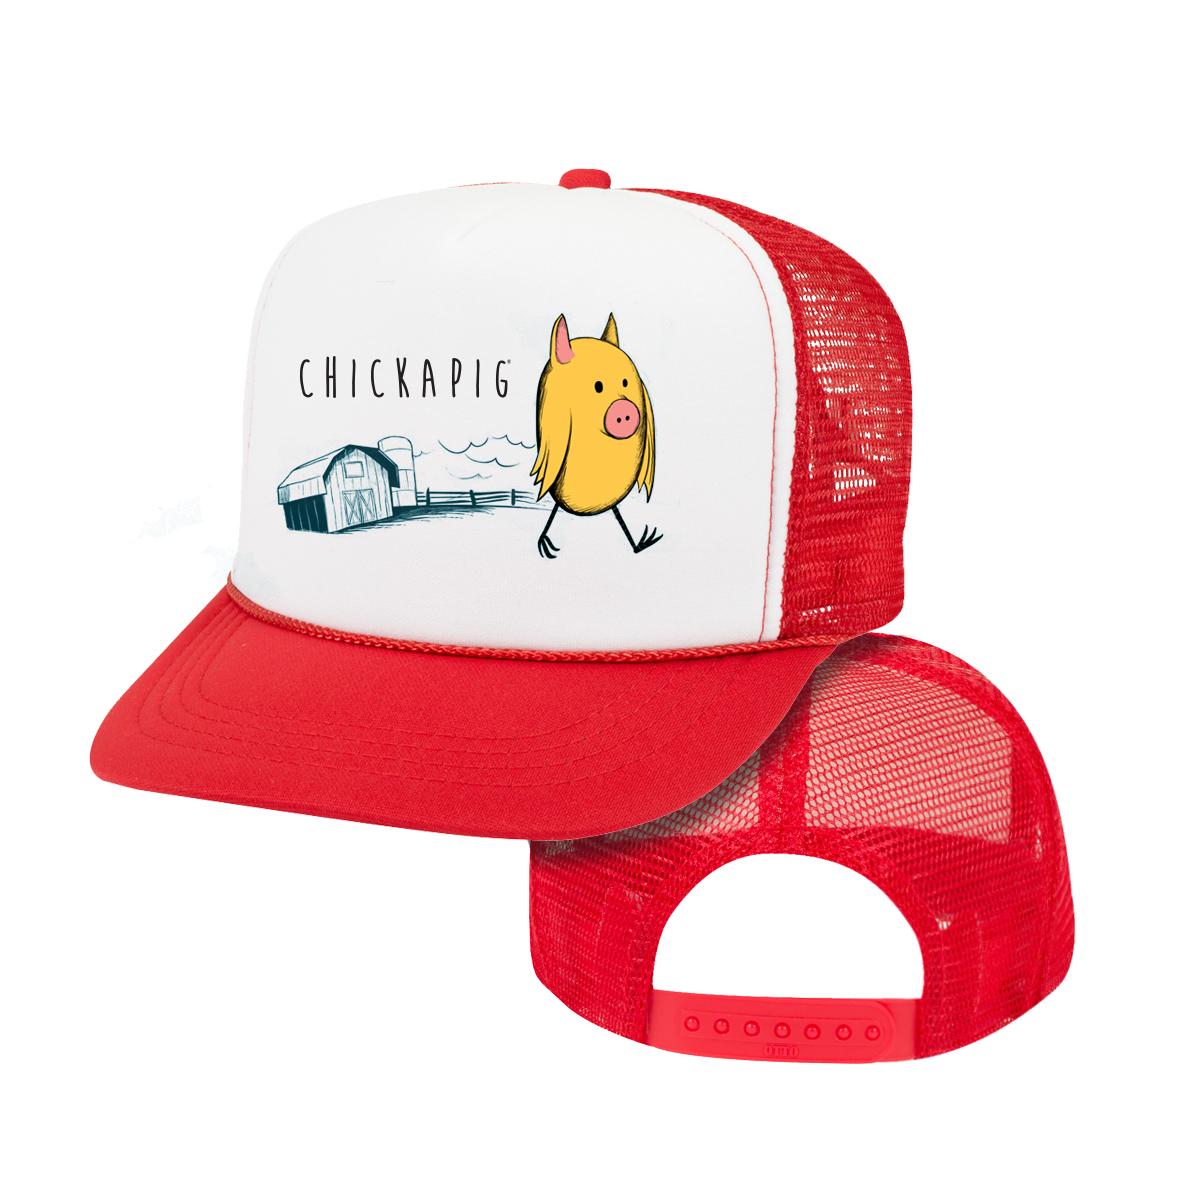 Little Joe Chickapig Youth Trucker Hat